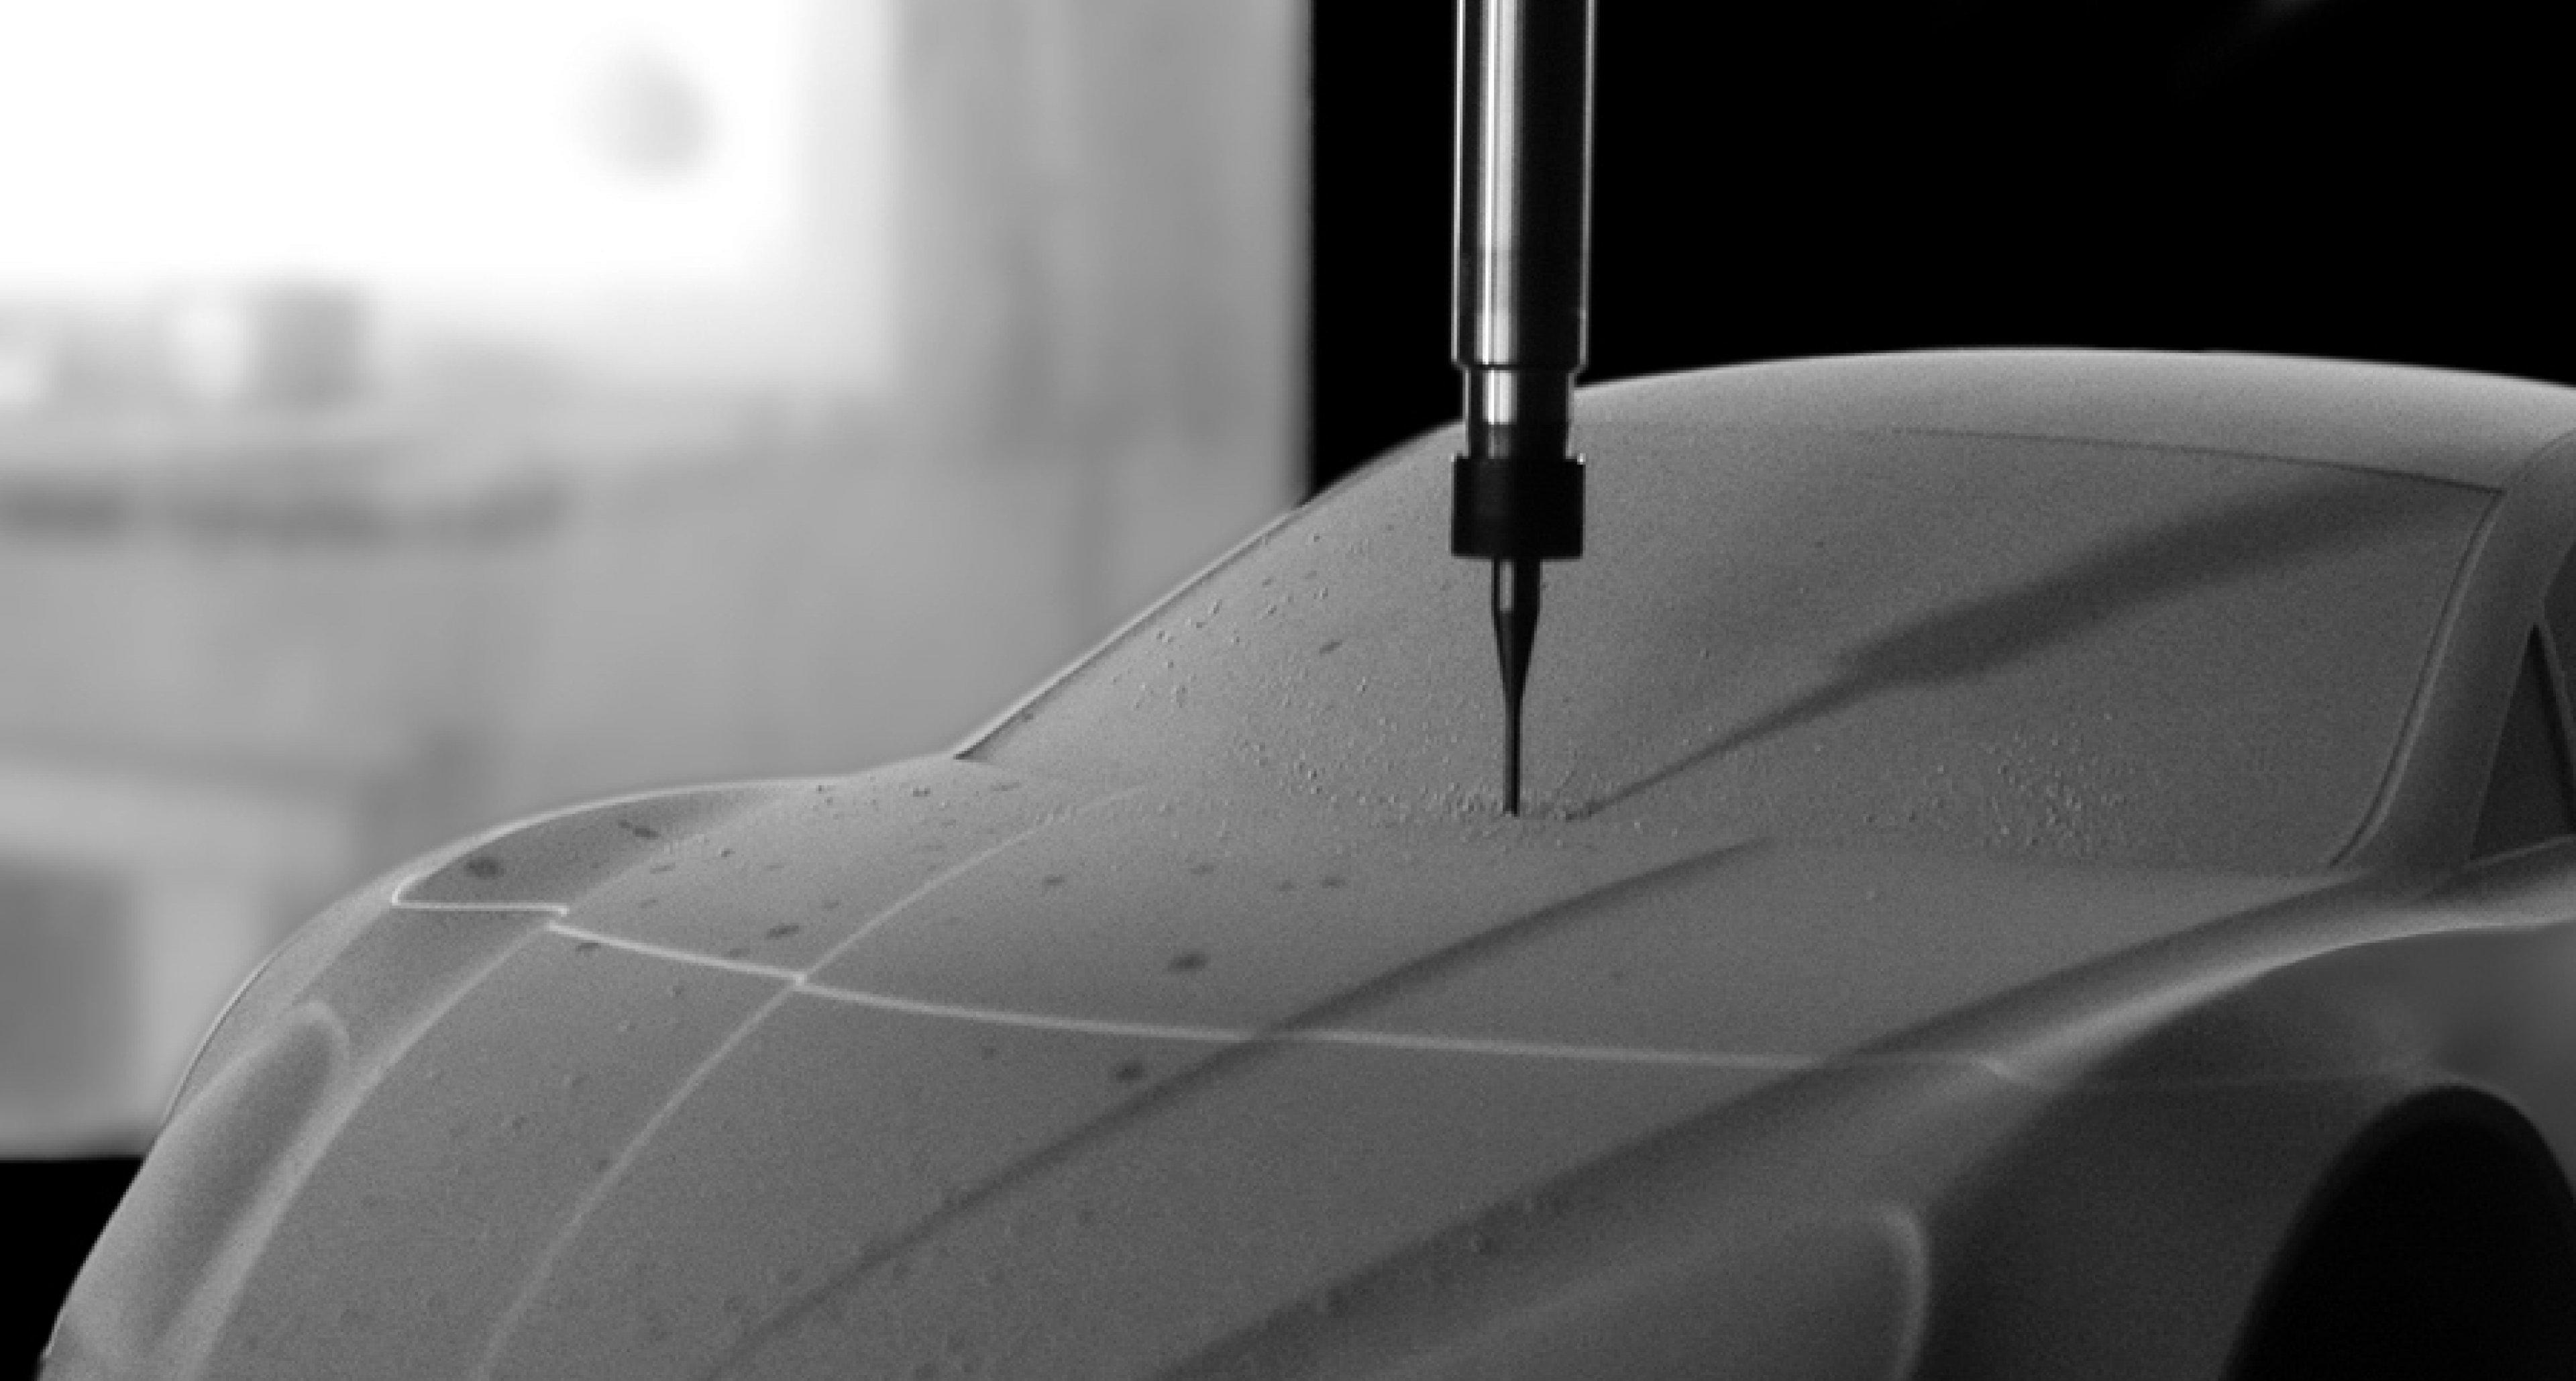 Sportwagenprojekt HBH: Technischer Workshop